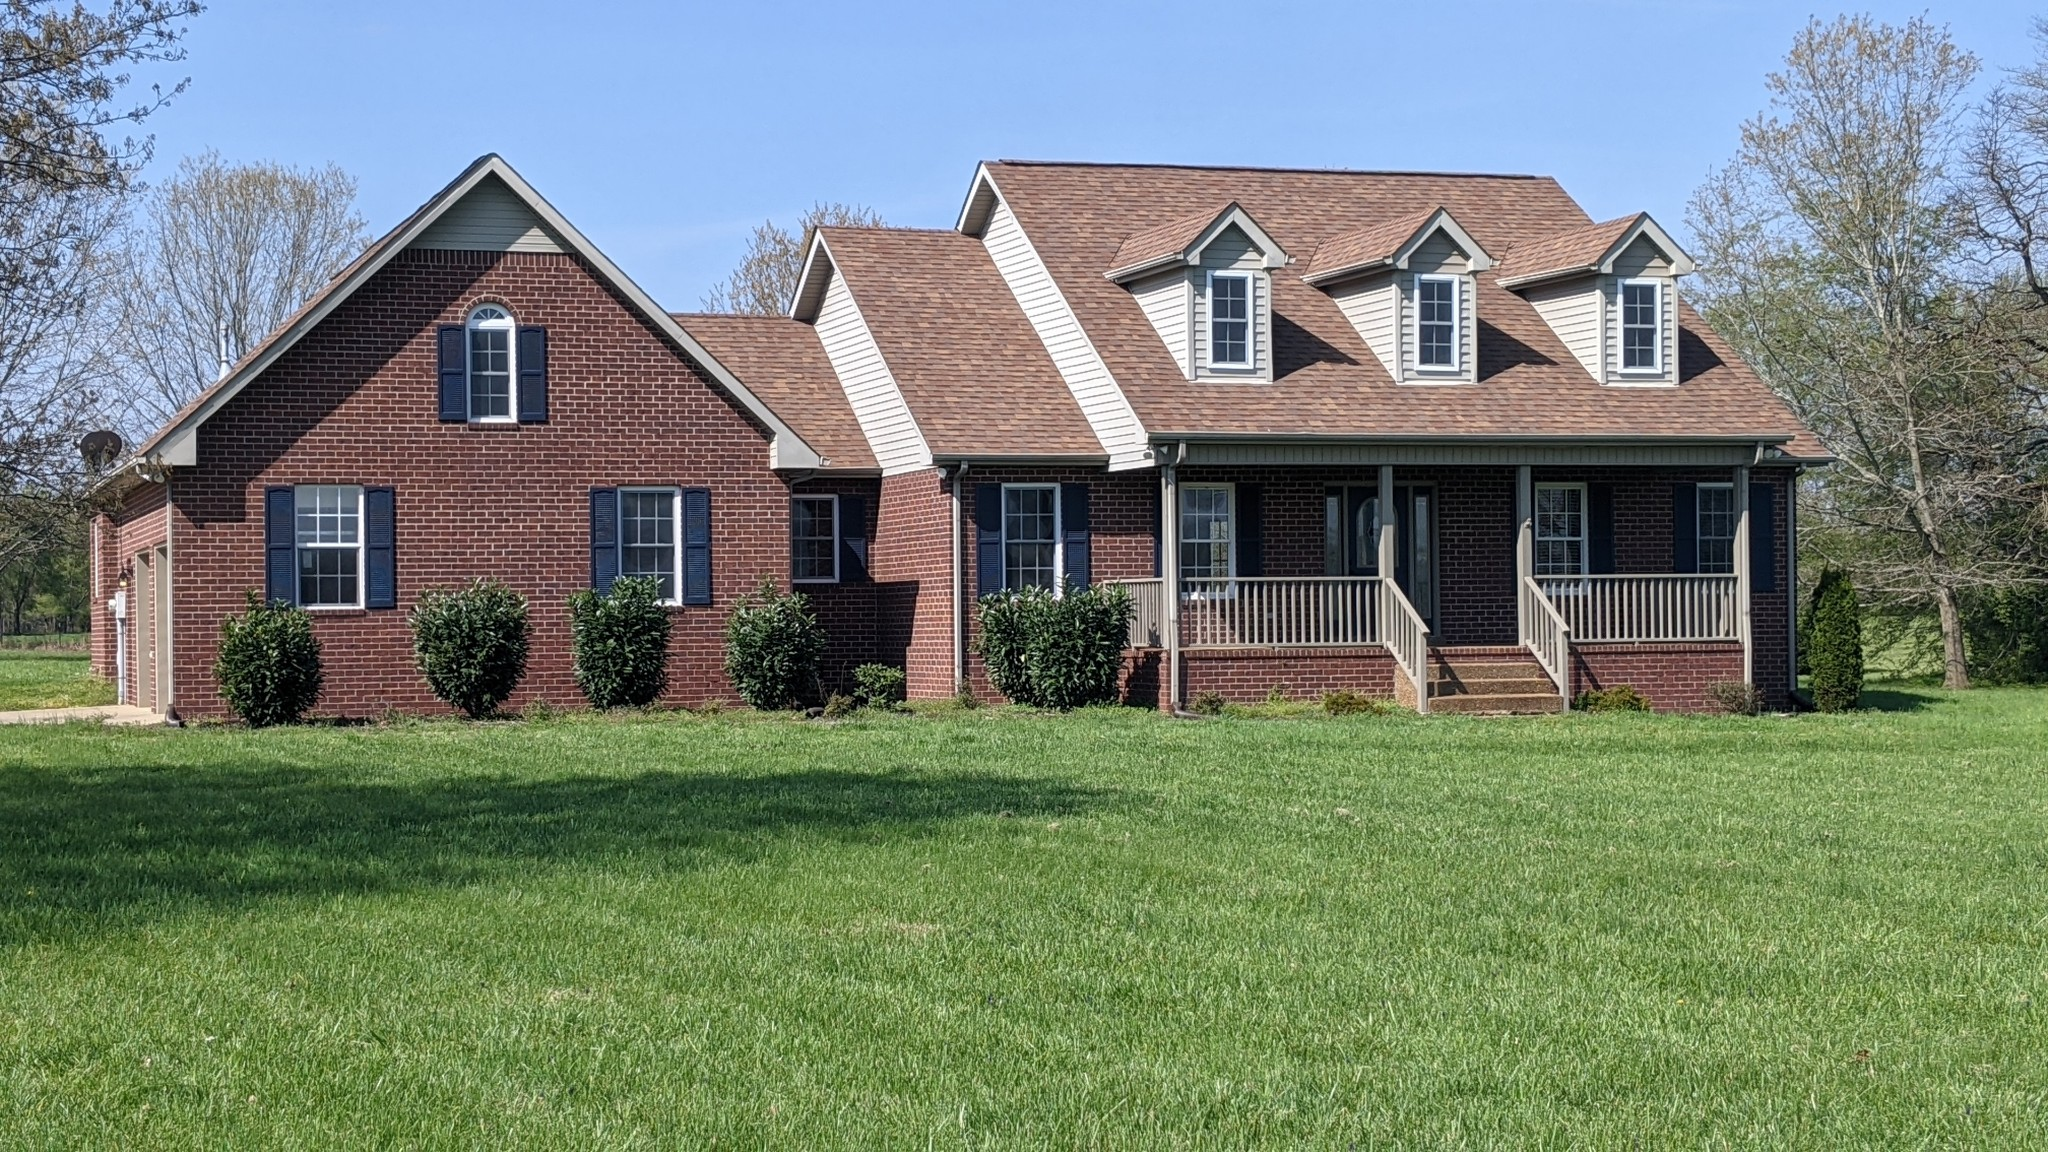 2948 Burgess Gower Rd Property Photo - Cedar Hill, TN real estate listing